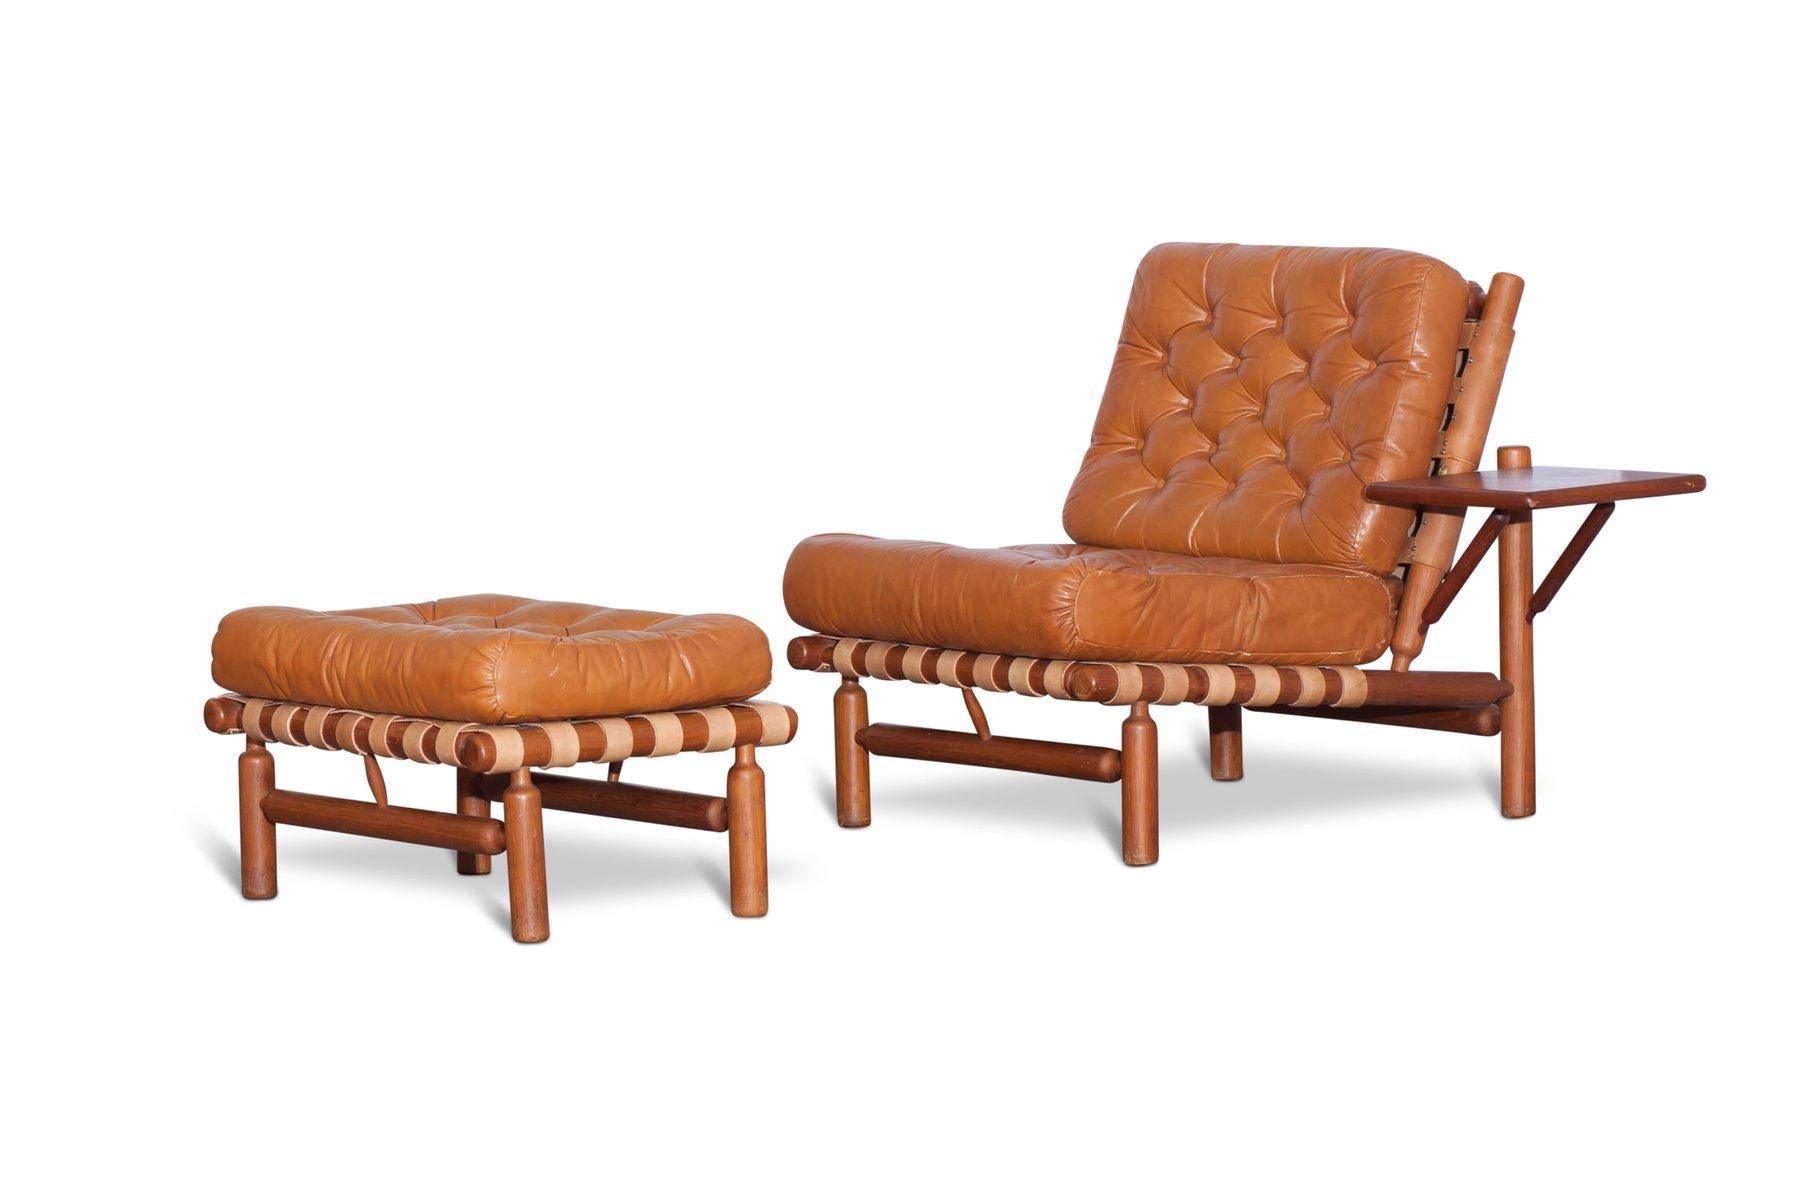 Cognac Lounge Chair With Ottoman By Ilmari Tapiovaara For Paolo Arnaboldi,  1957